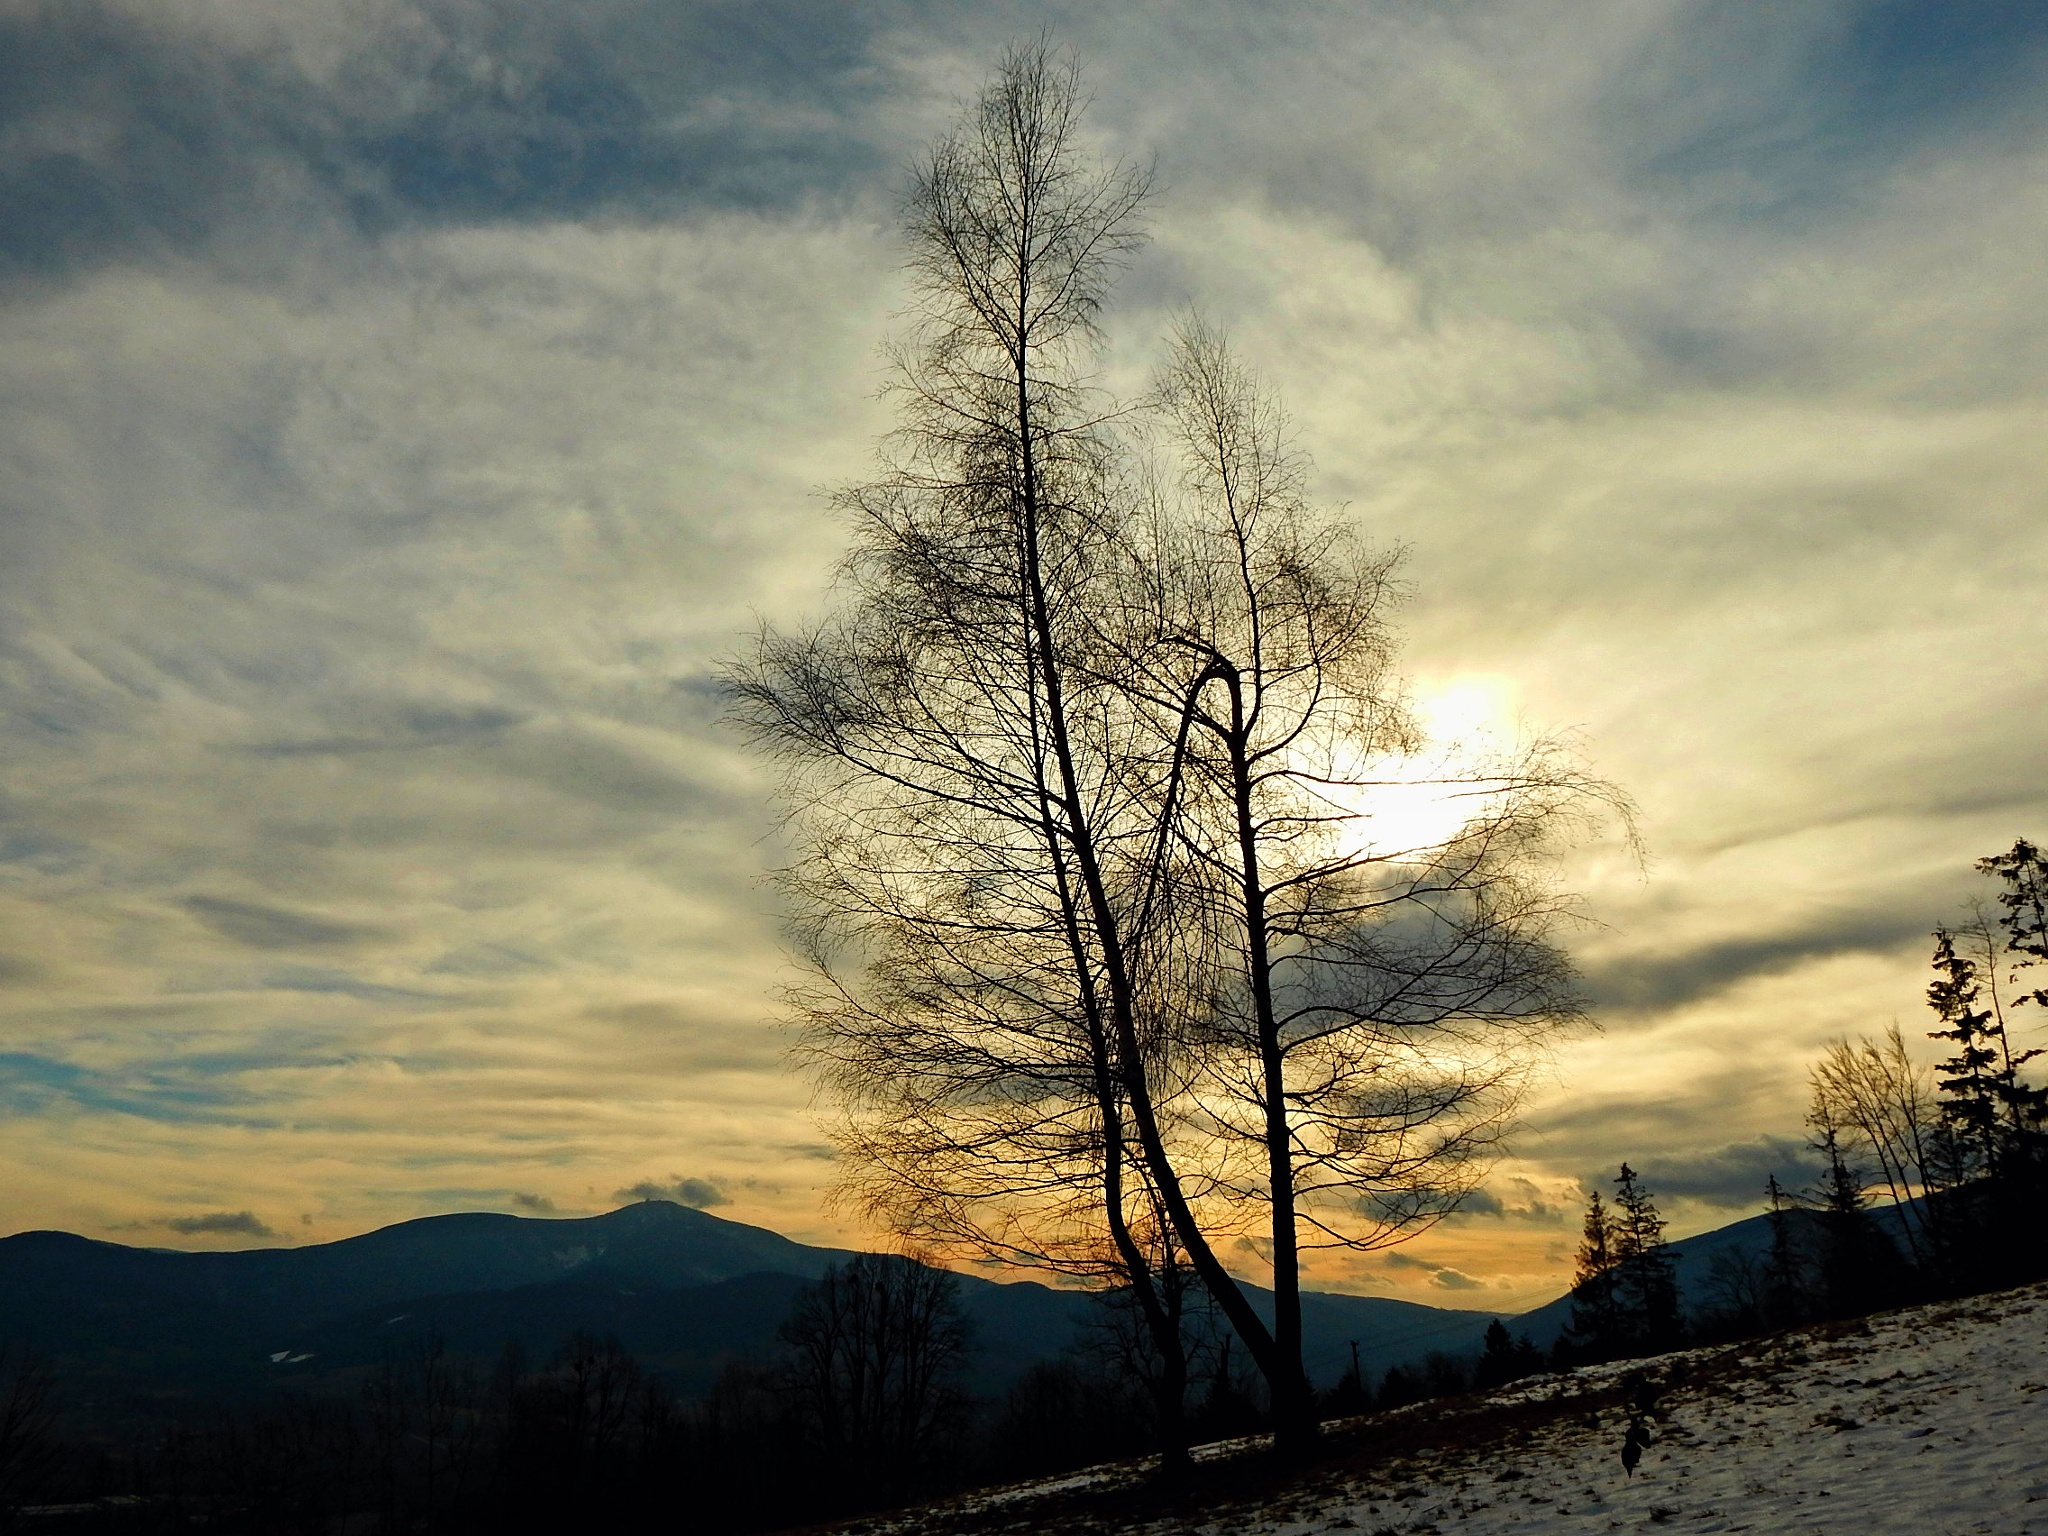 Lysa hora from Ondřejník by songerekova